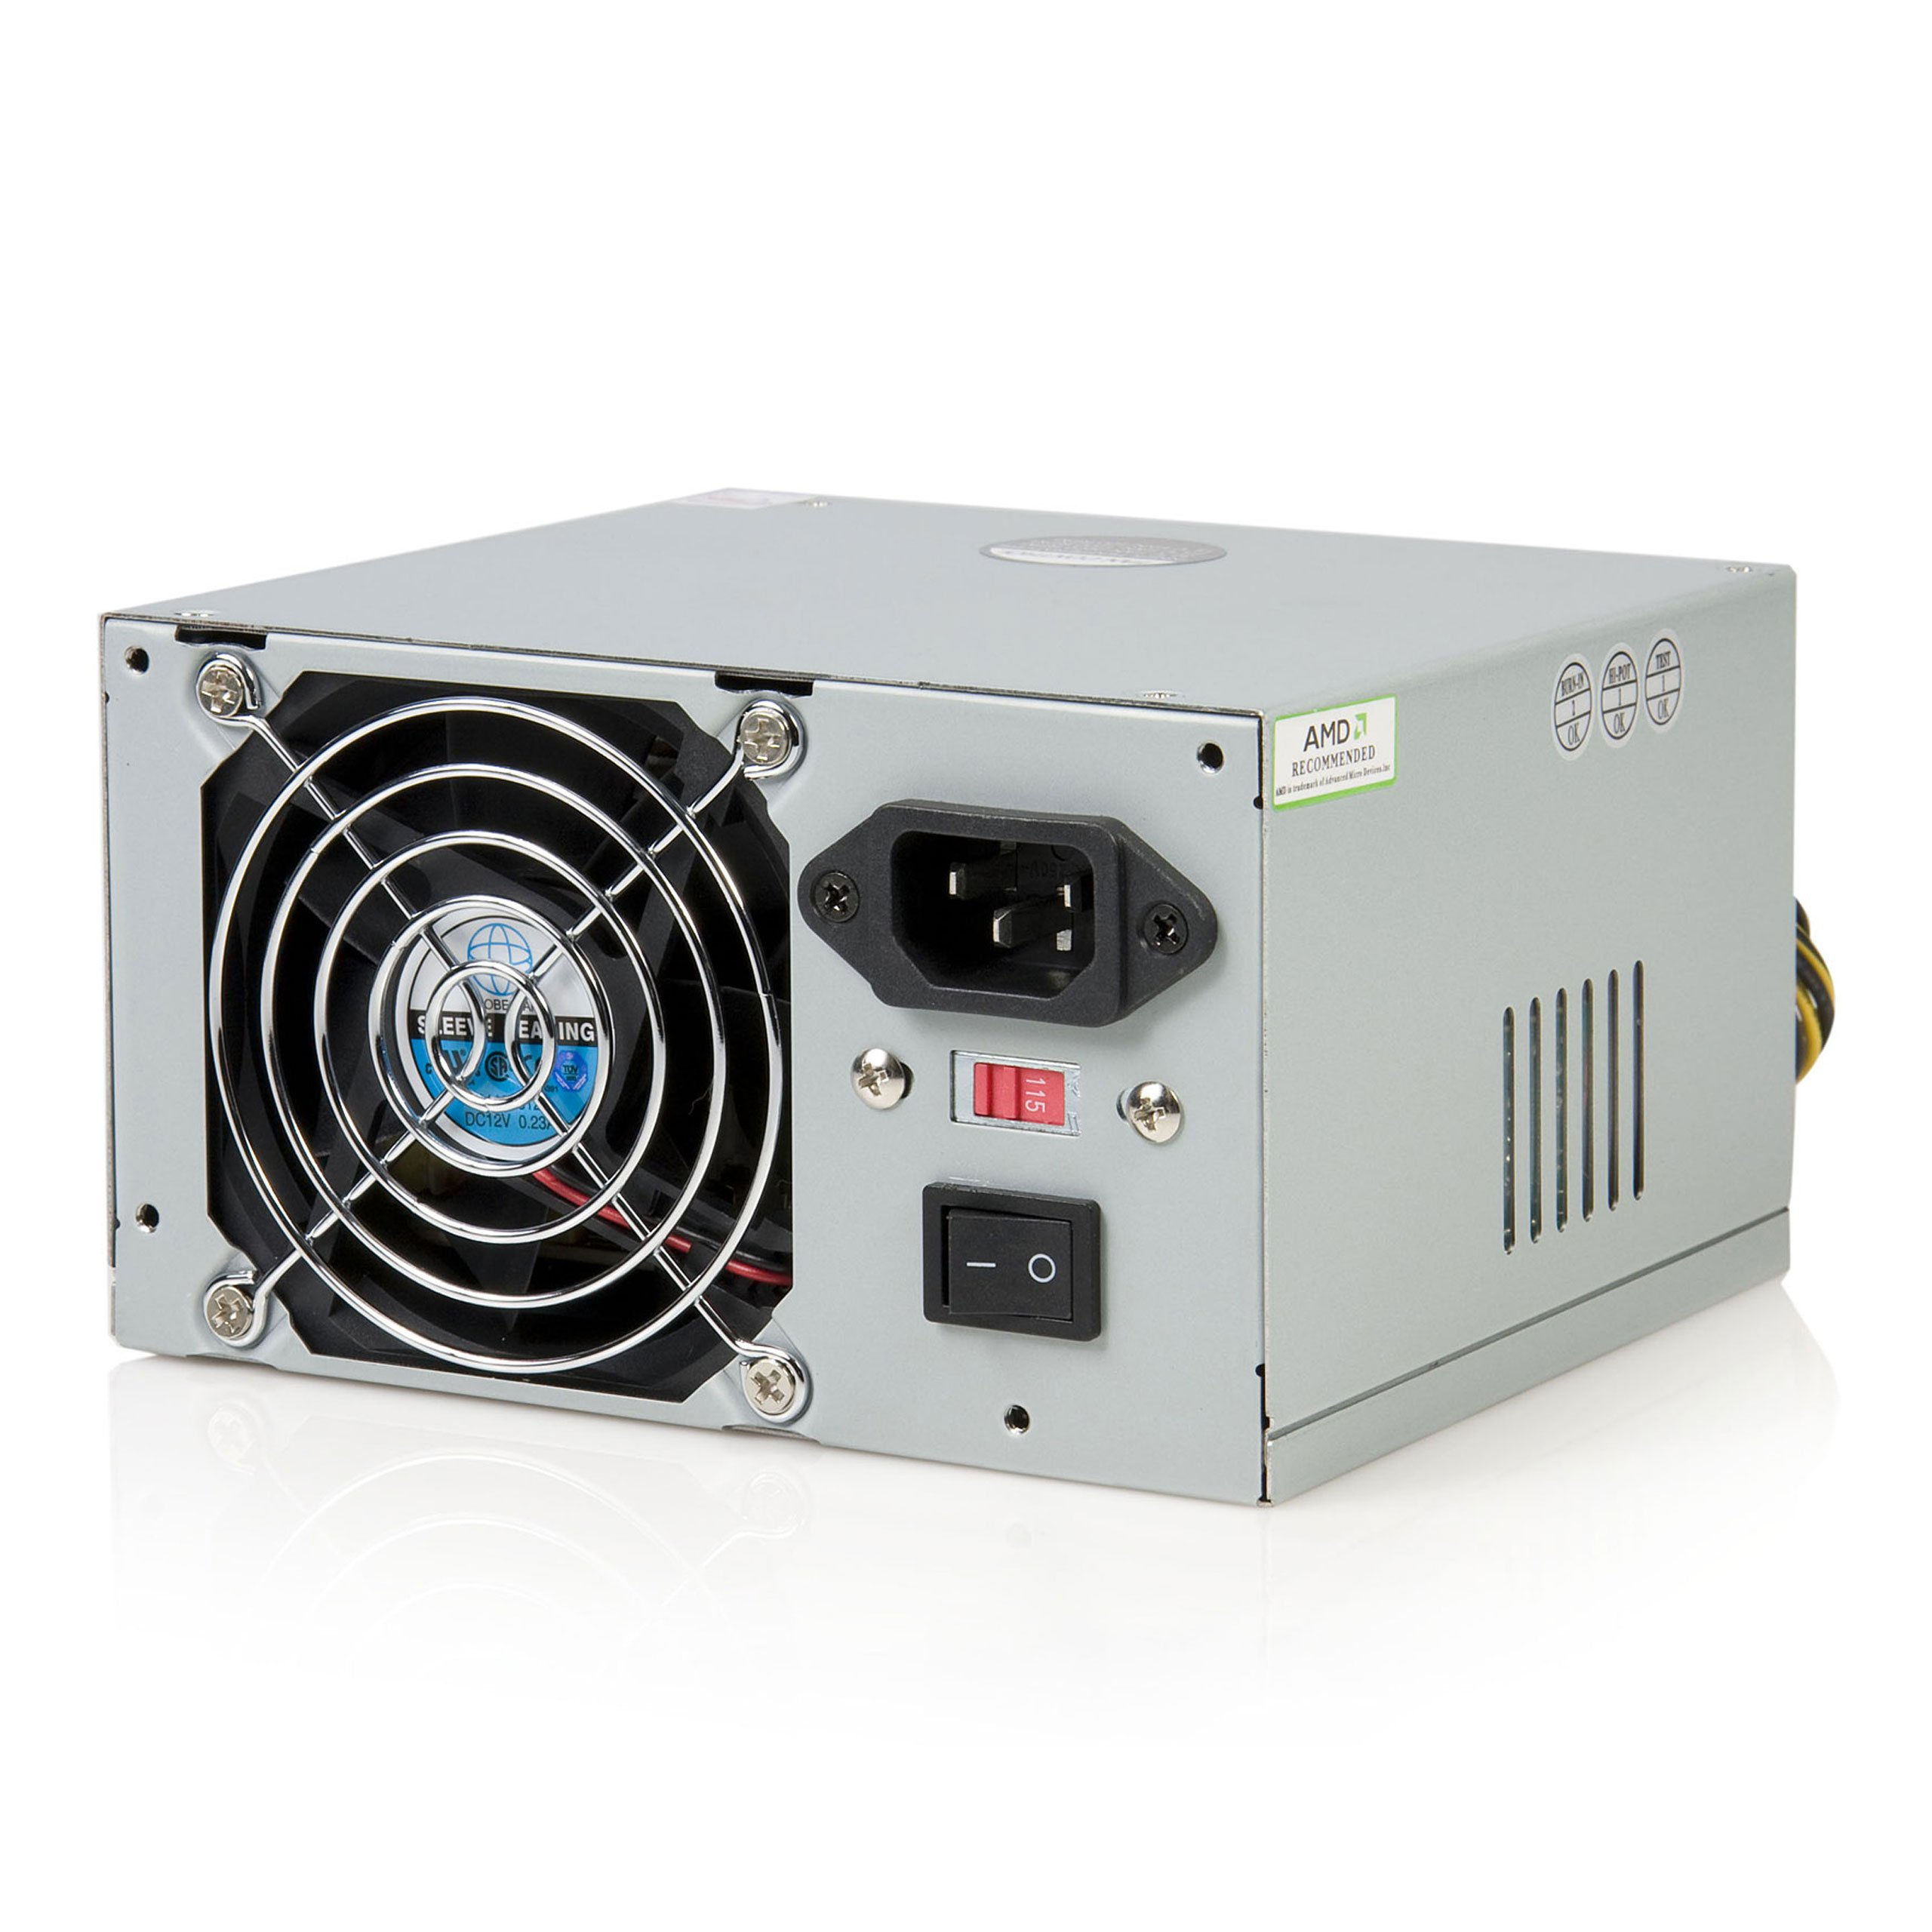 350 Watt ATX12V 2.01 Computer PC Power Supply w/ 20 & 24 Pin